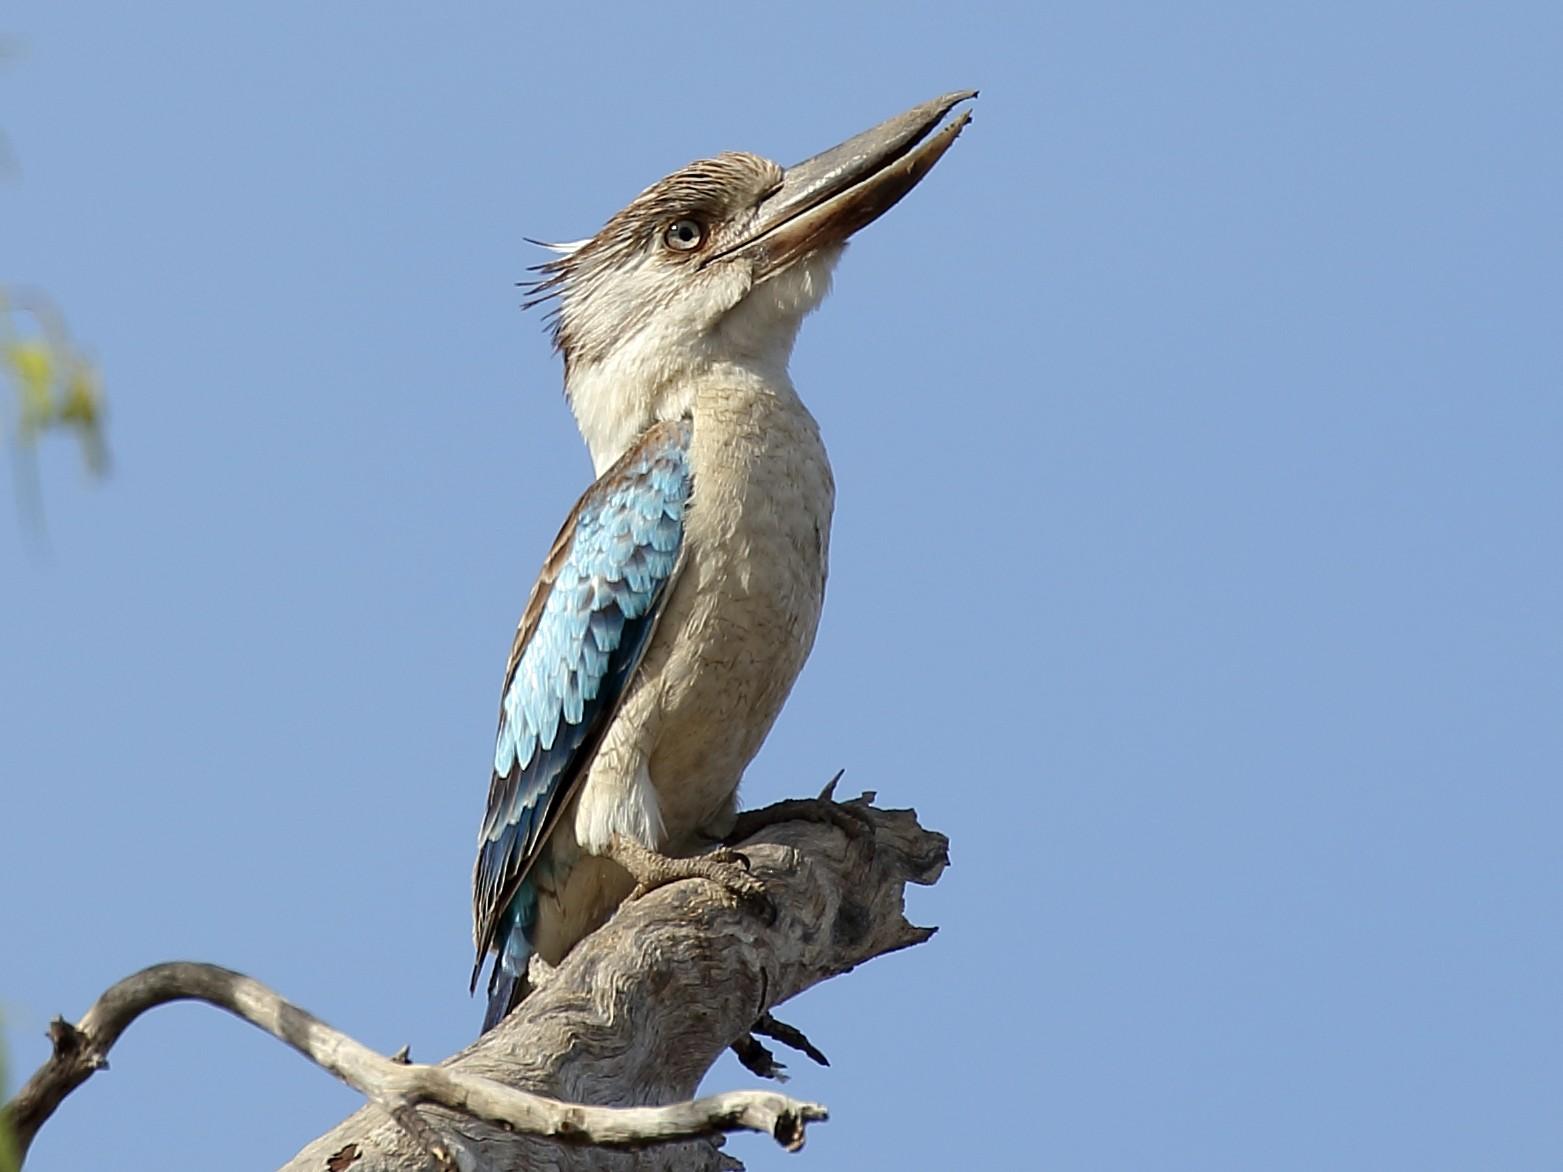 Blue-winged Kookaburra - Michael Rutkowski